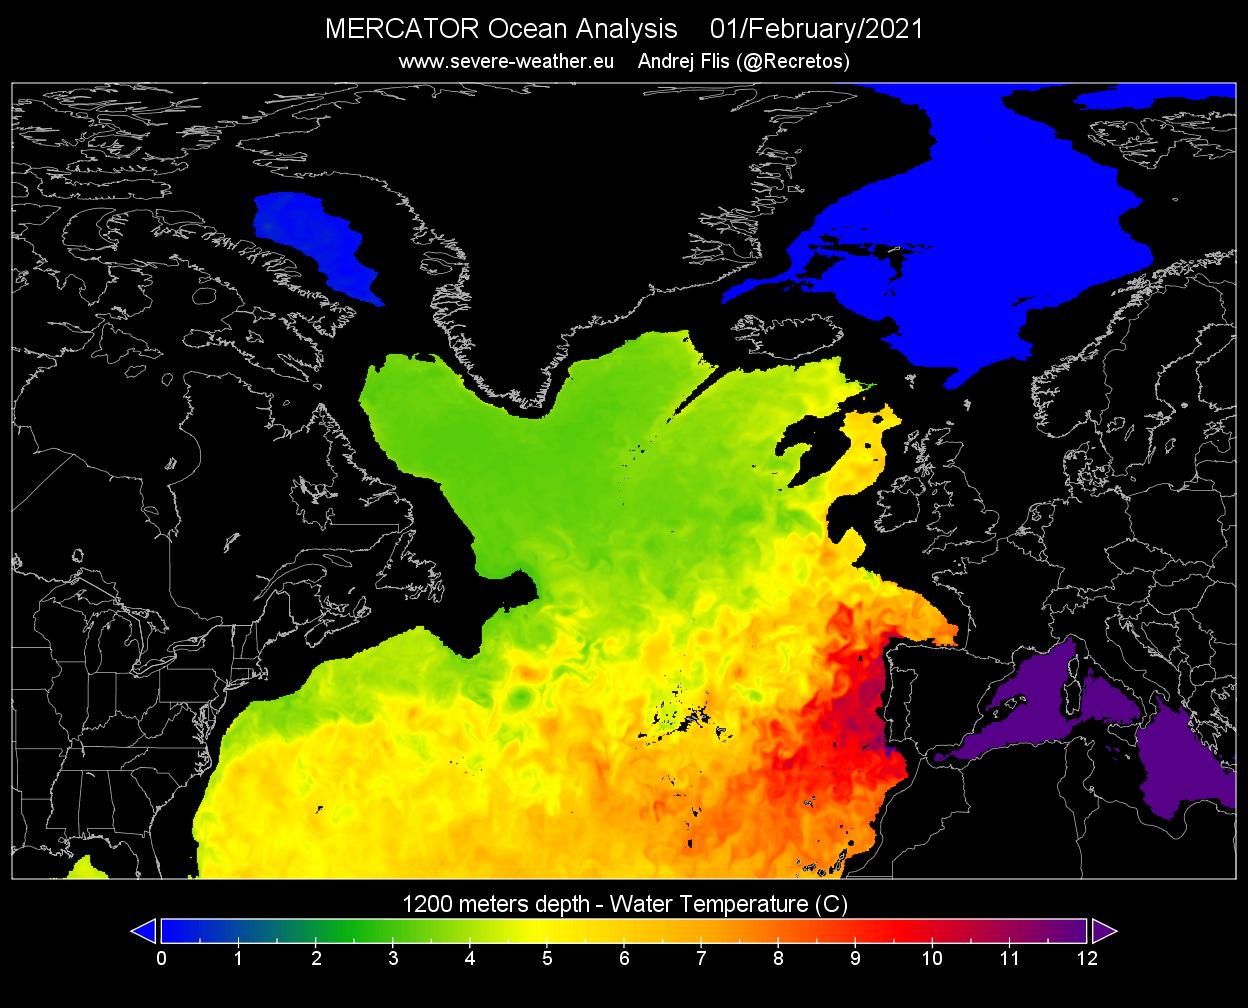 gulf-stream-ocean-1200-meters-depth-temperature-usa-europe-map